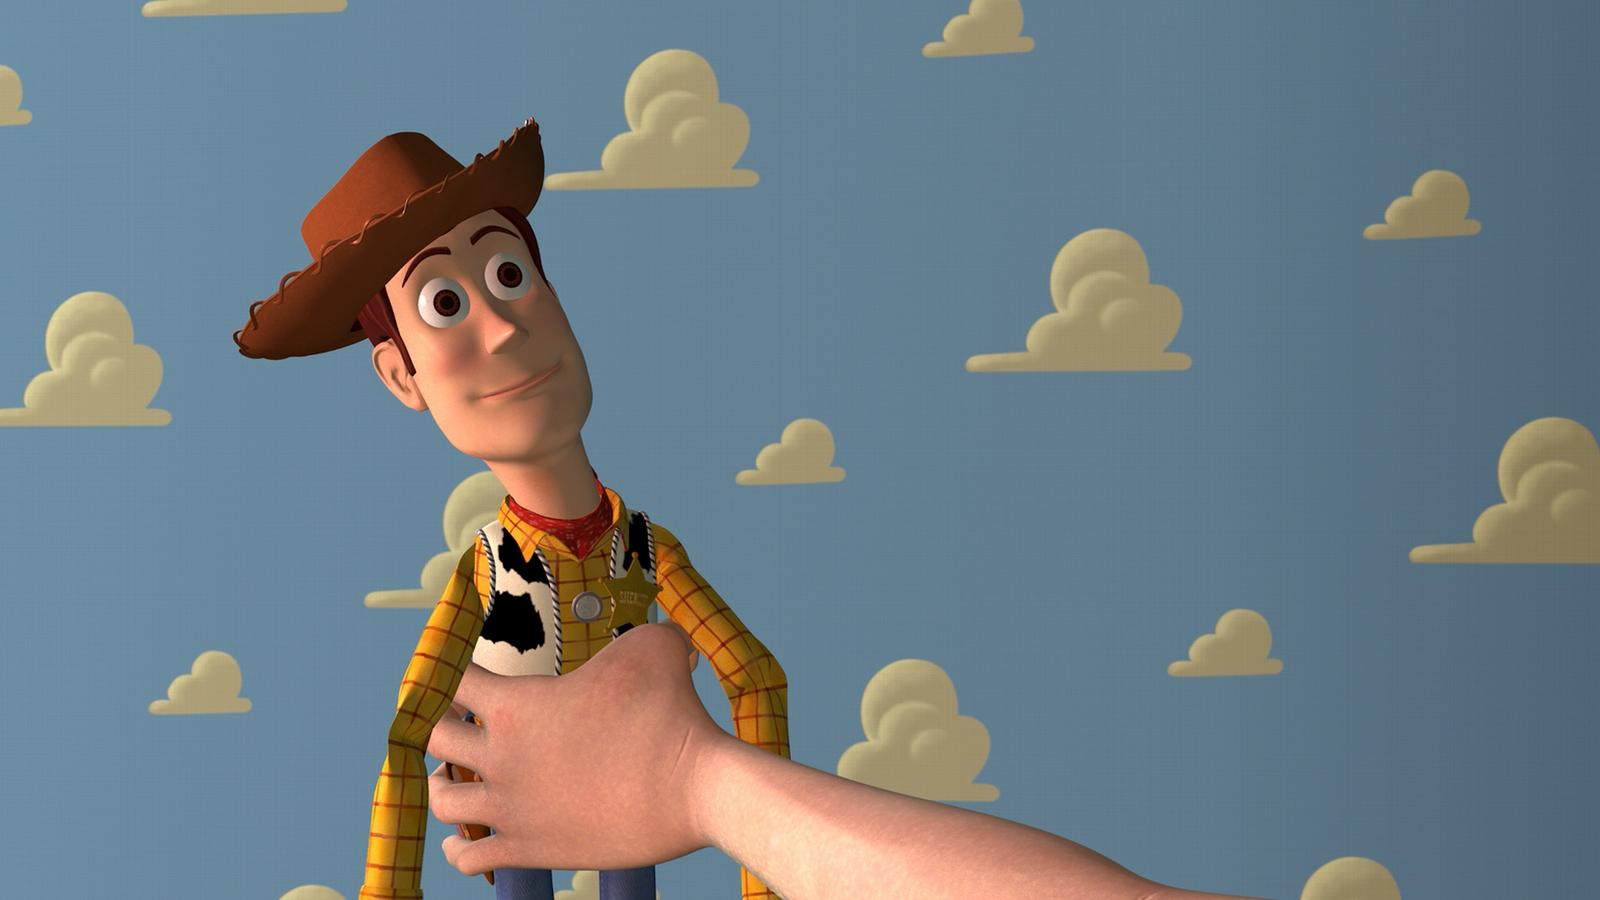 Woody Image